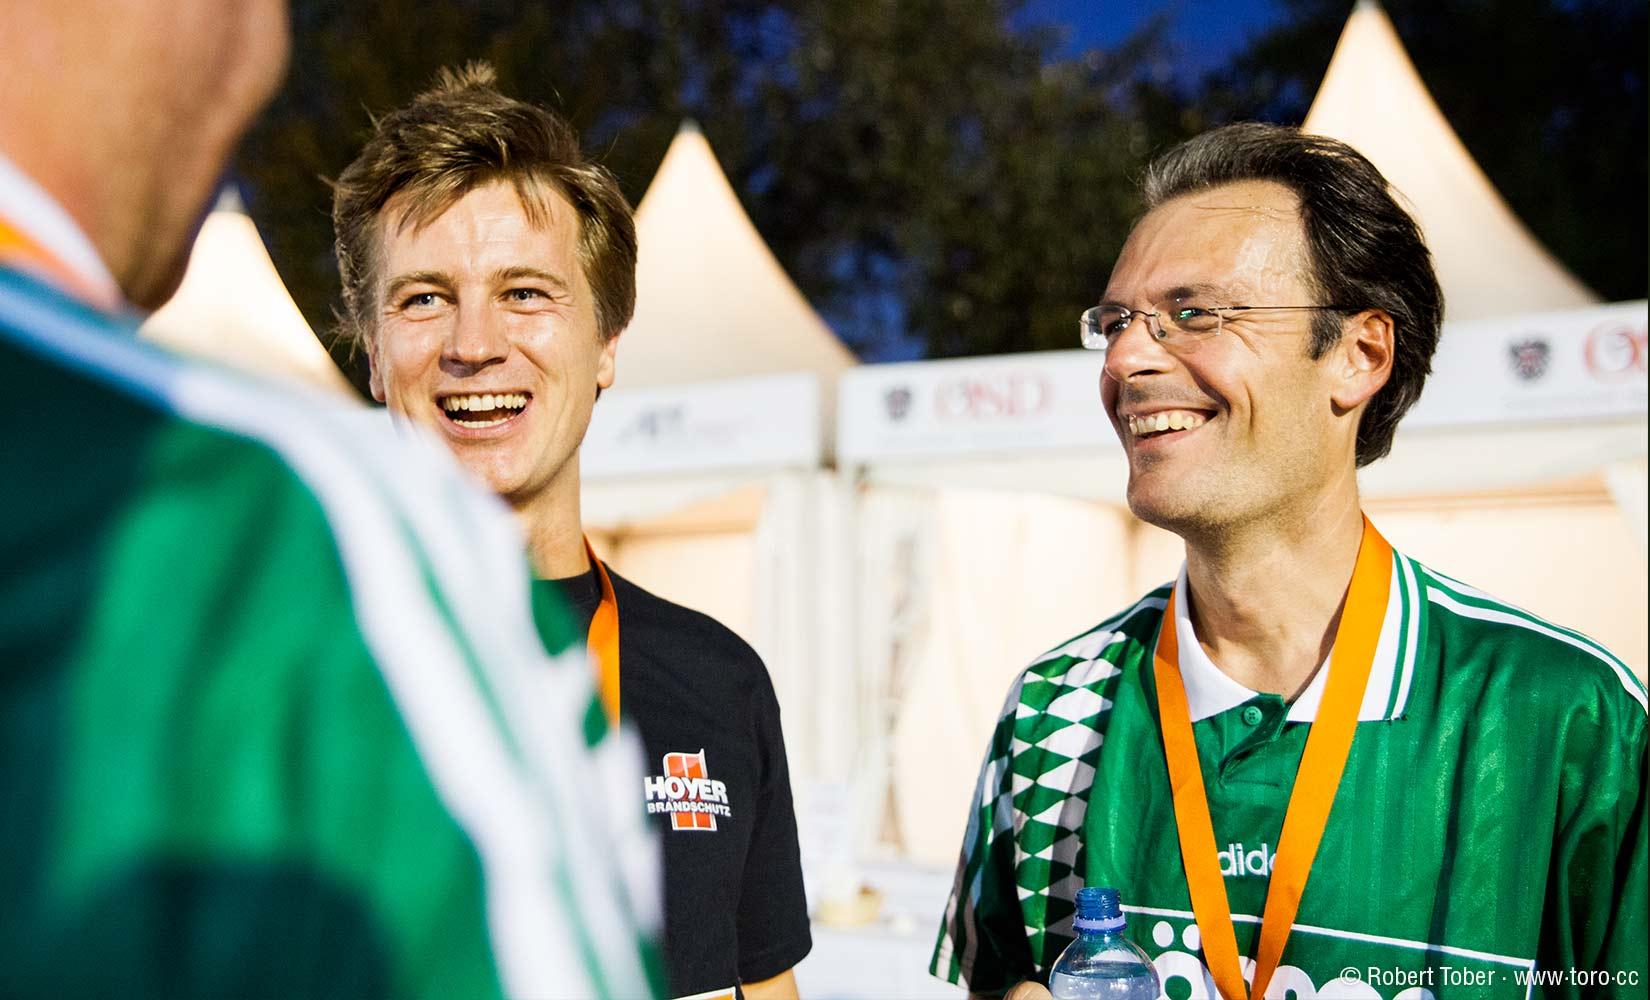 Ing. Werner Hoyer-Weber · CEO Hoyer Brandschutz © Robert Tober · www.toro.cc